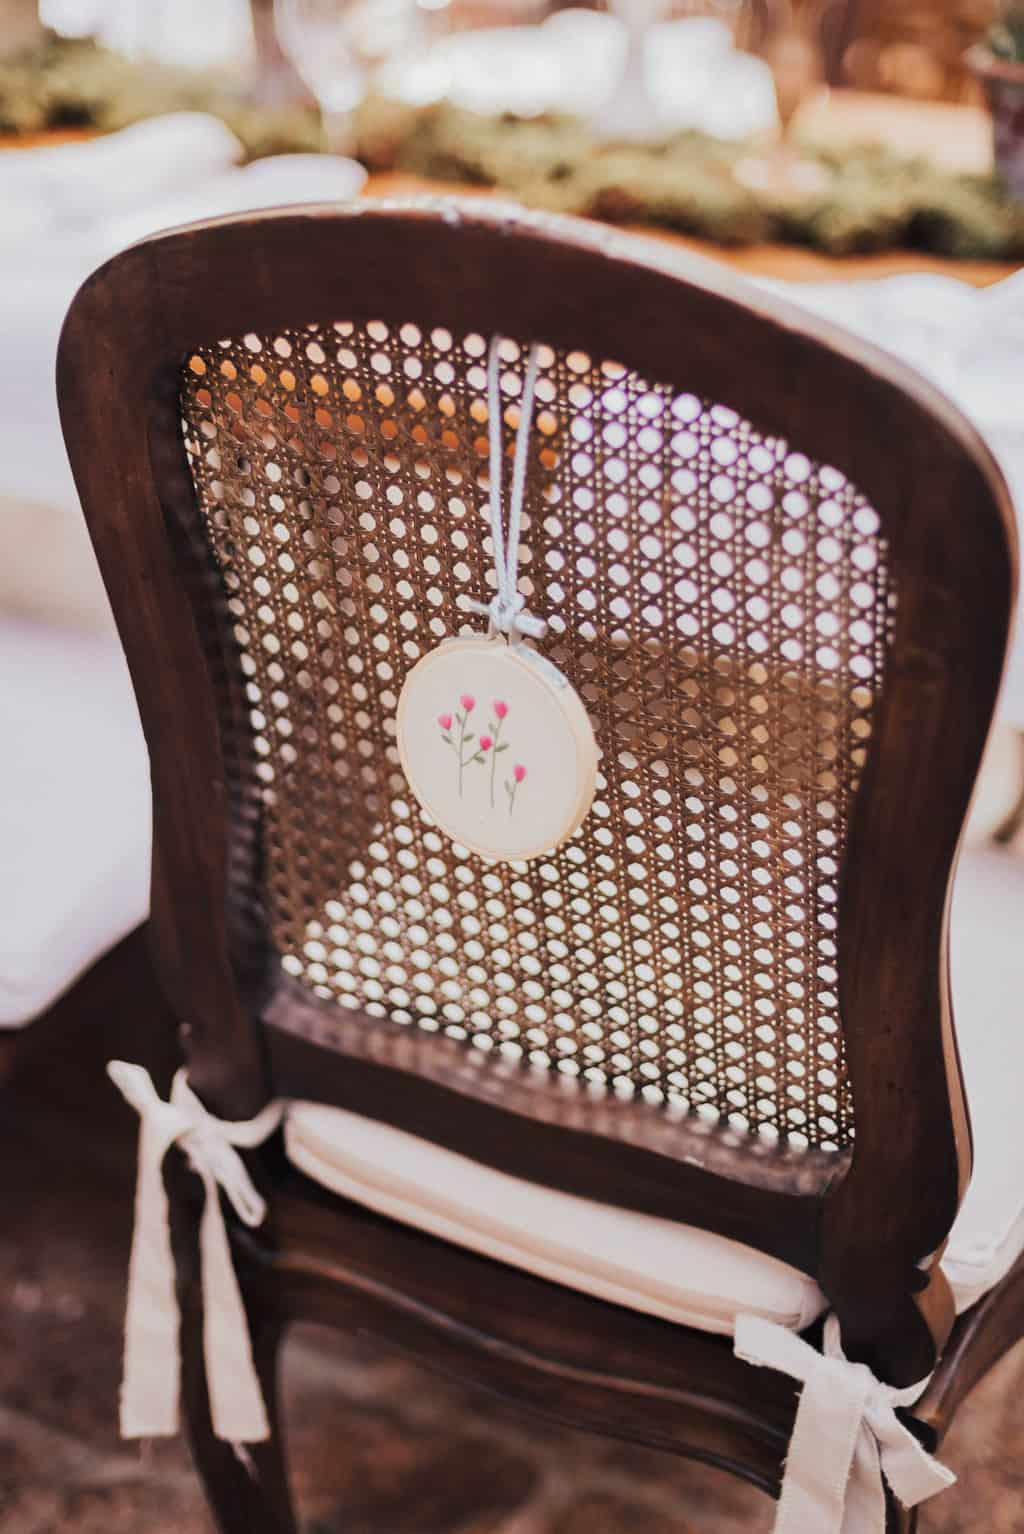 Boutique-de-Cena-casamento-Rebeca-e-Eldrey-Fazenda-Vila-Rica-Fotografia-Mana-Gollo-mesa-dos-convidados-Toda-de-Branco22